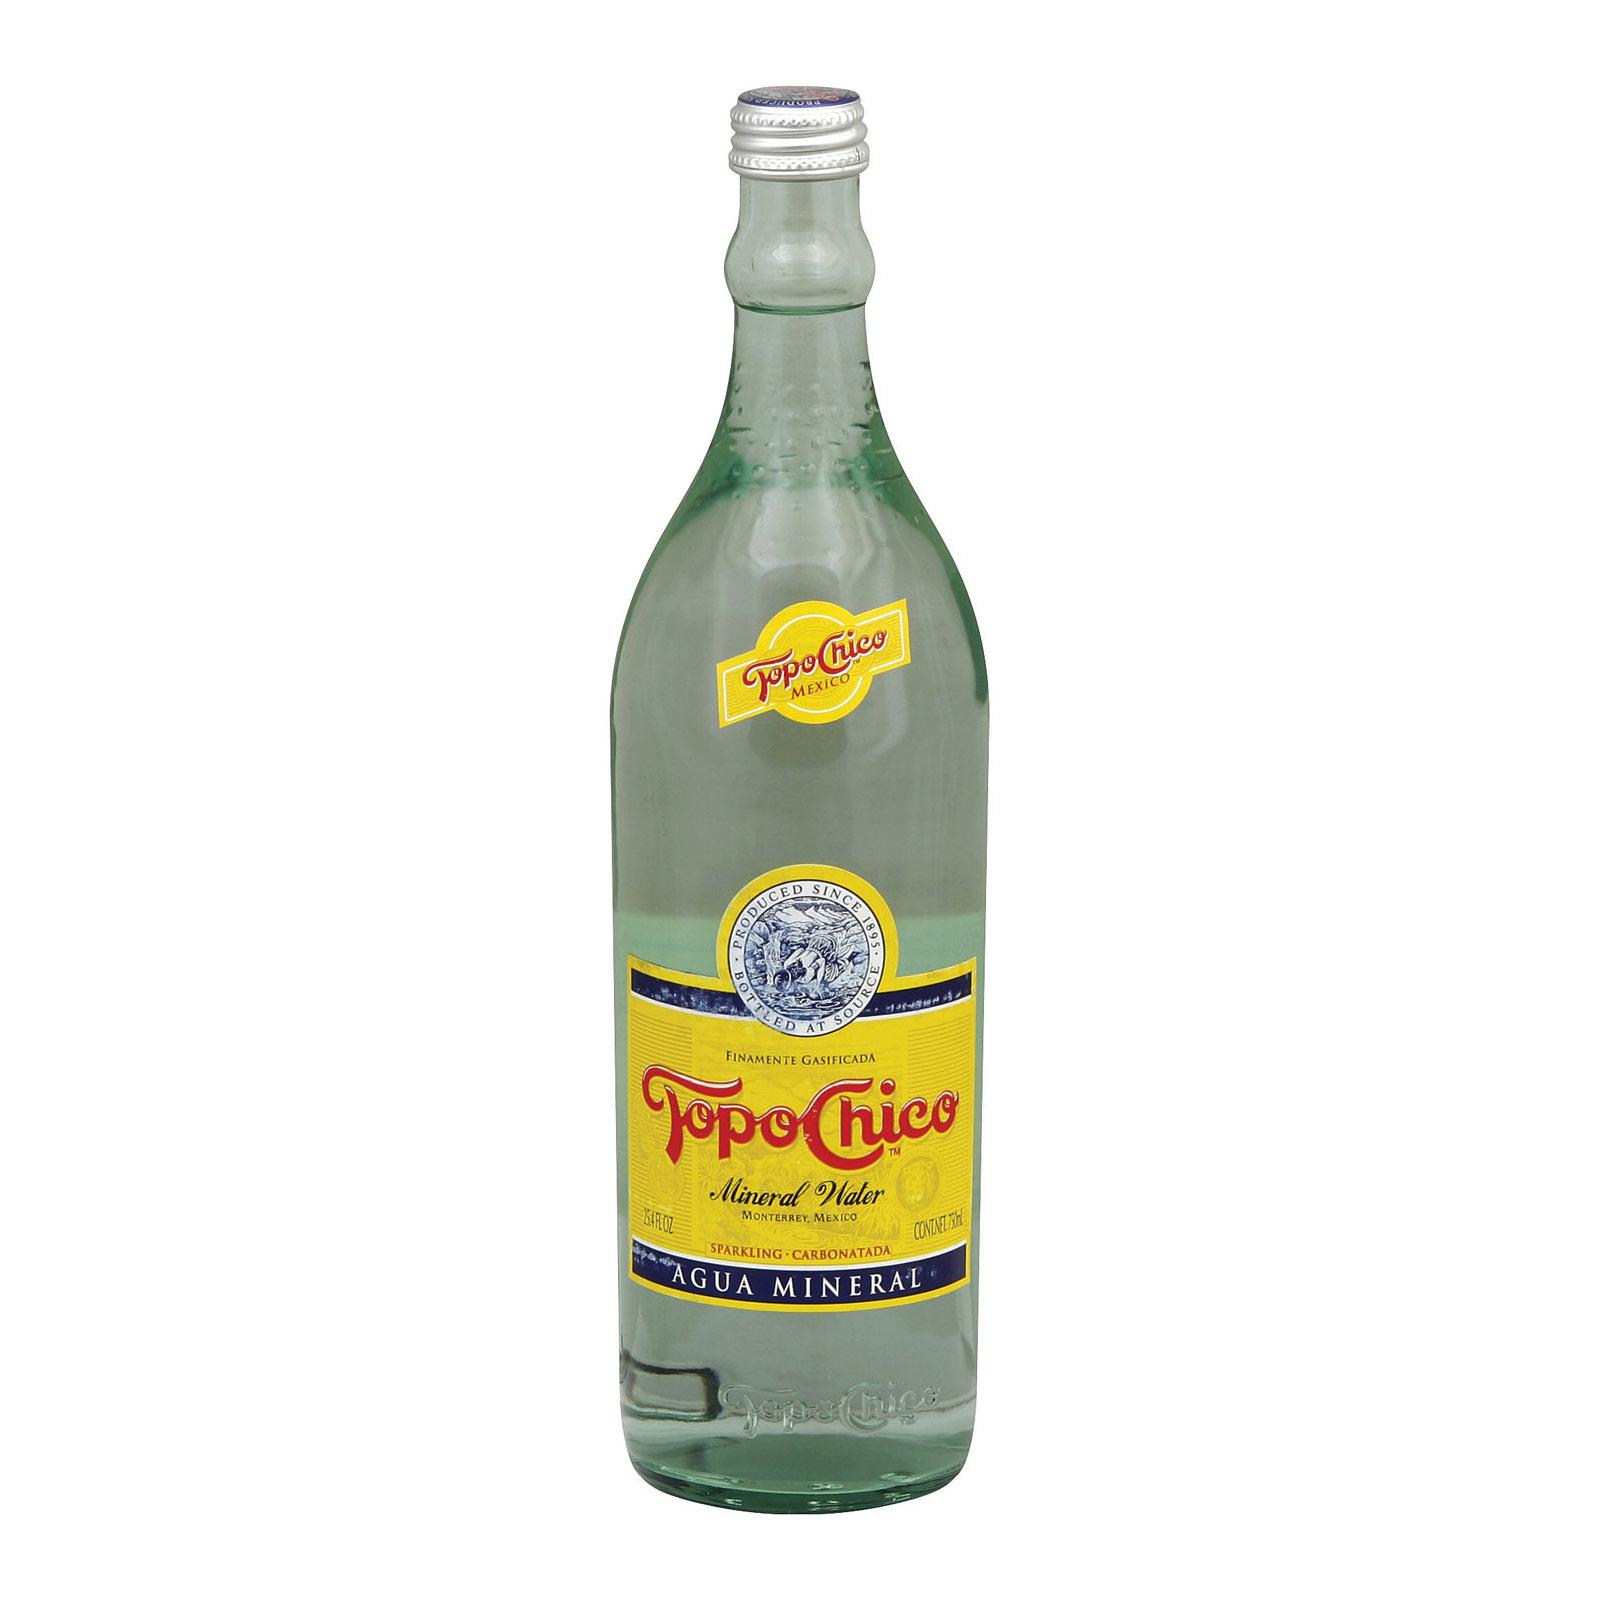 Topo Chico Mineral Water - Case of 12 - 25.4 oz